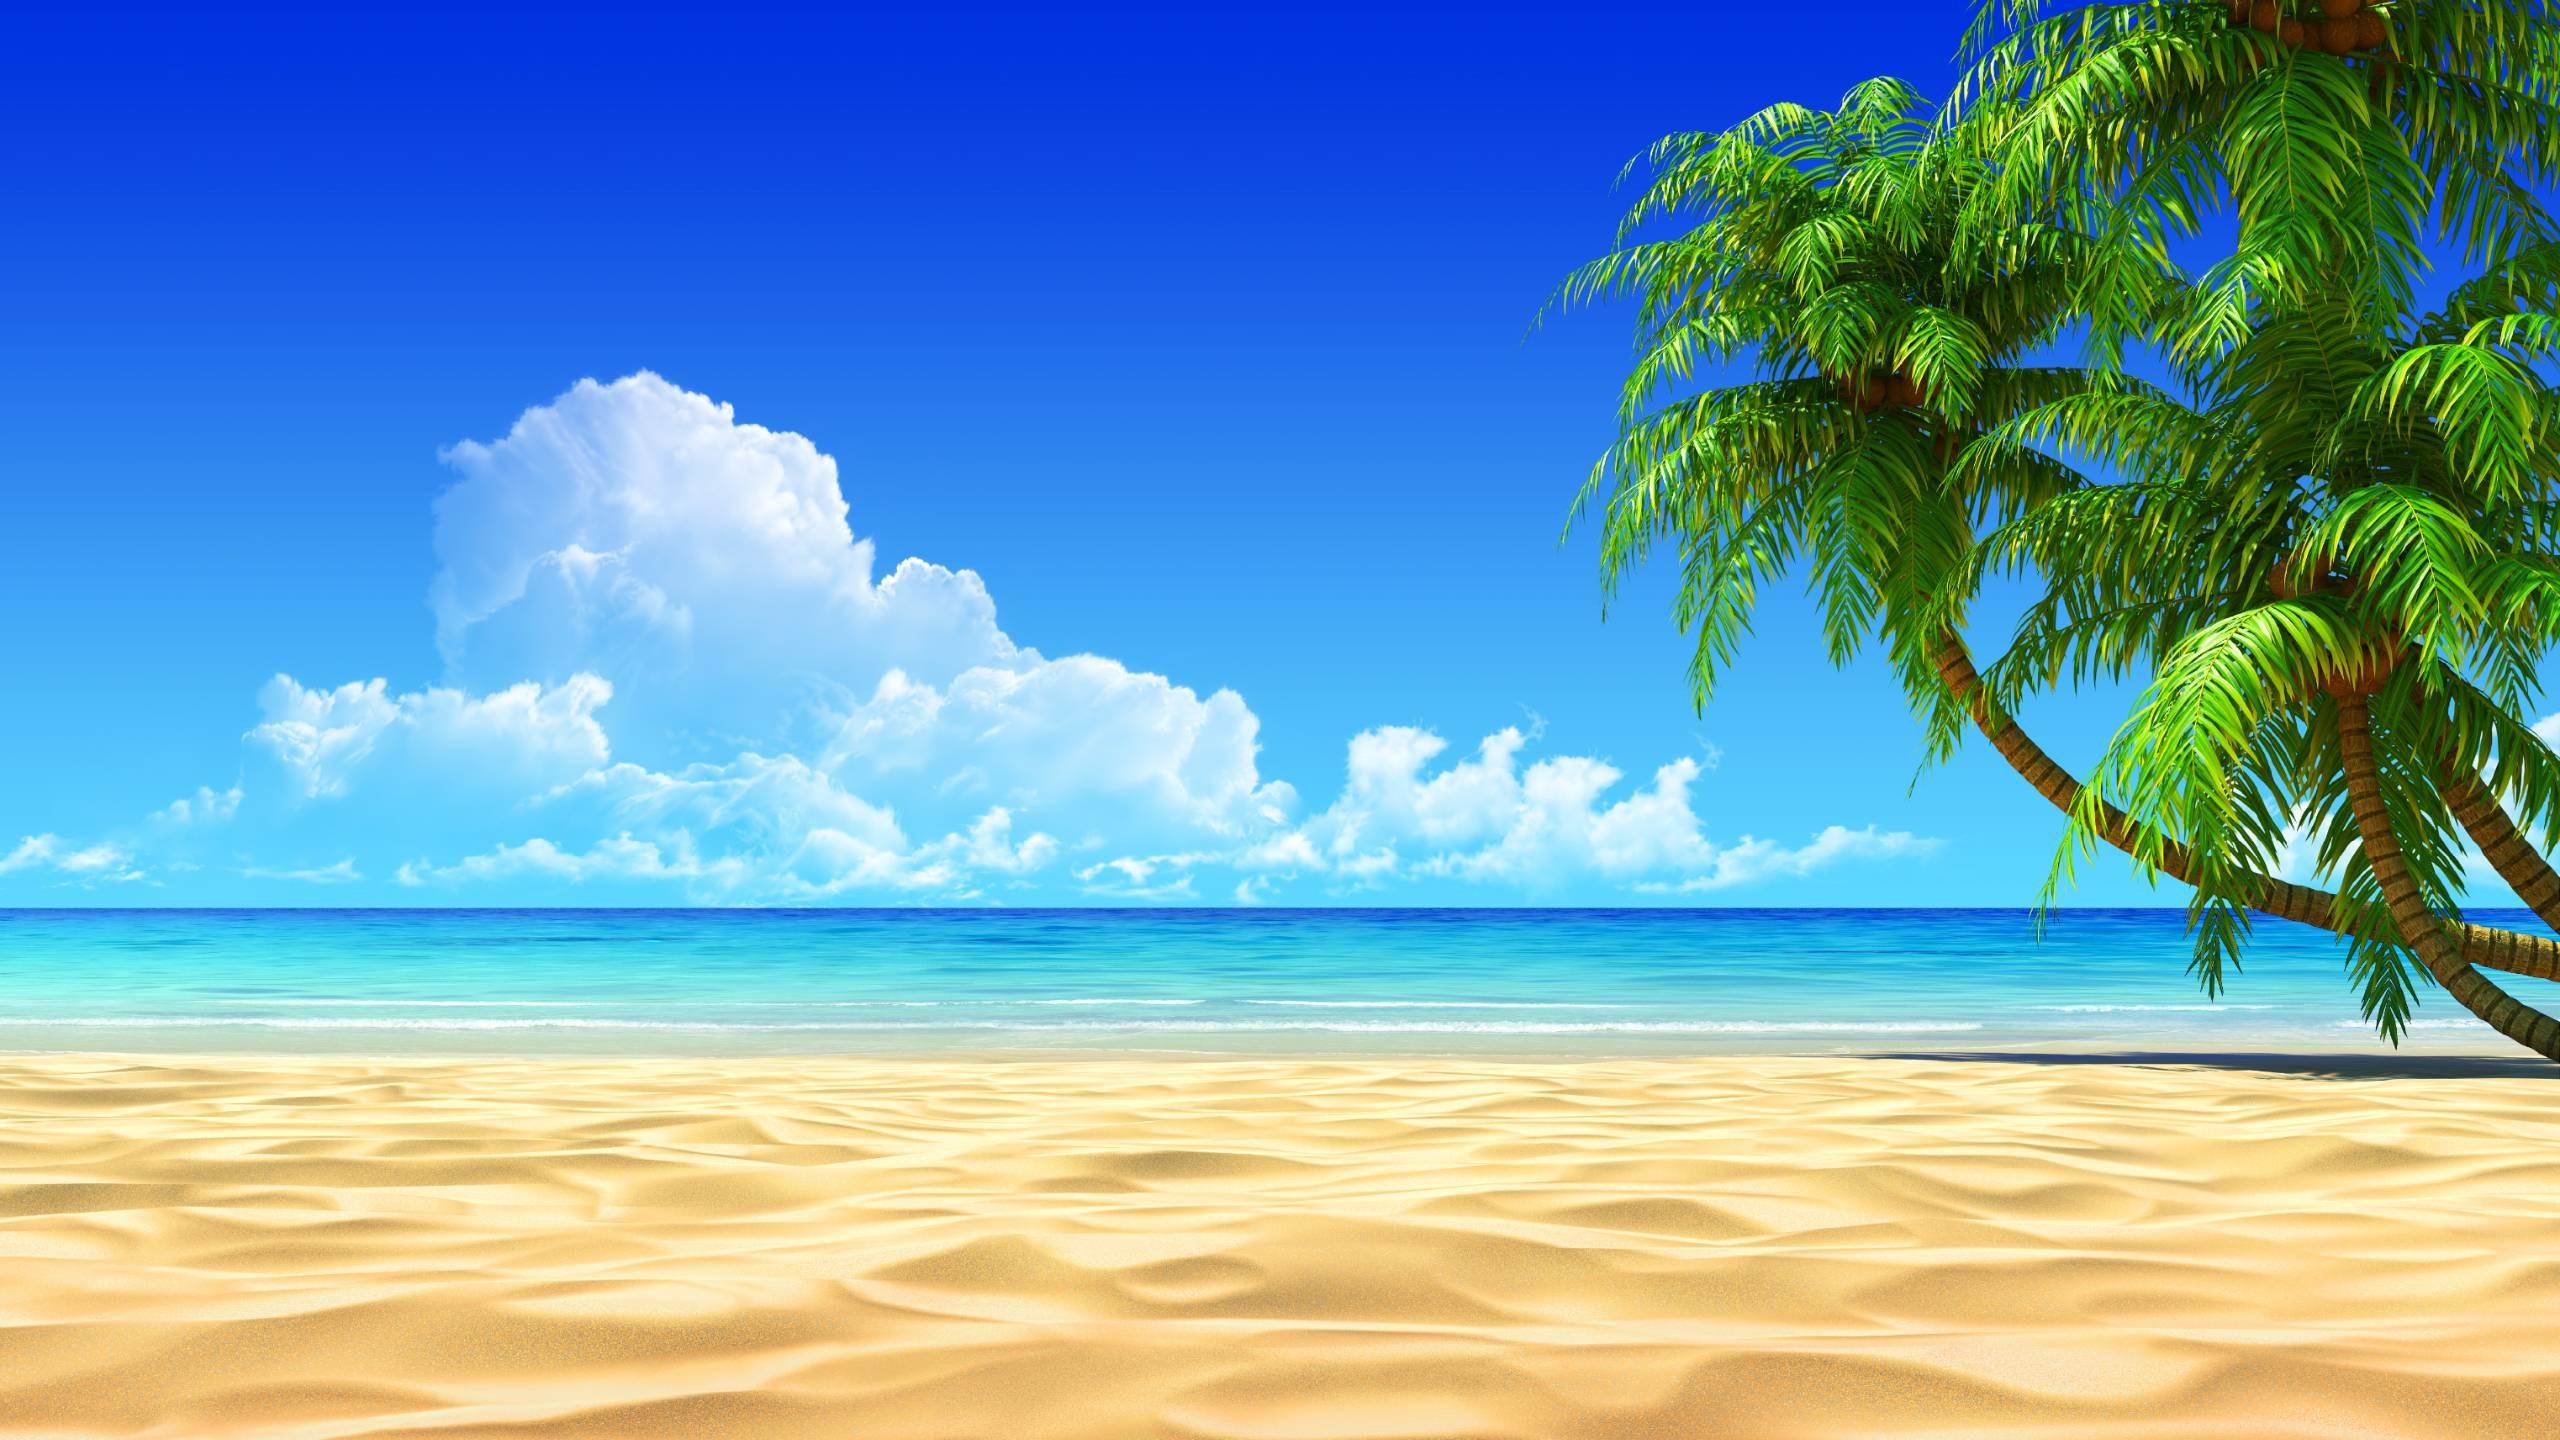 2560x1440 Monster Energy Desktop Wallpaper 1024A 768 High Definition Download Beautiful Tropical